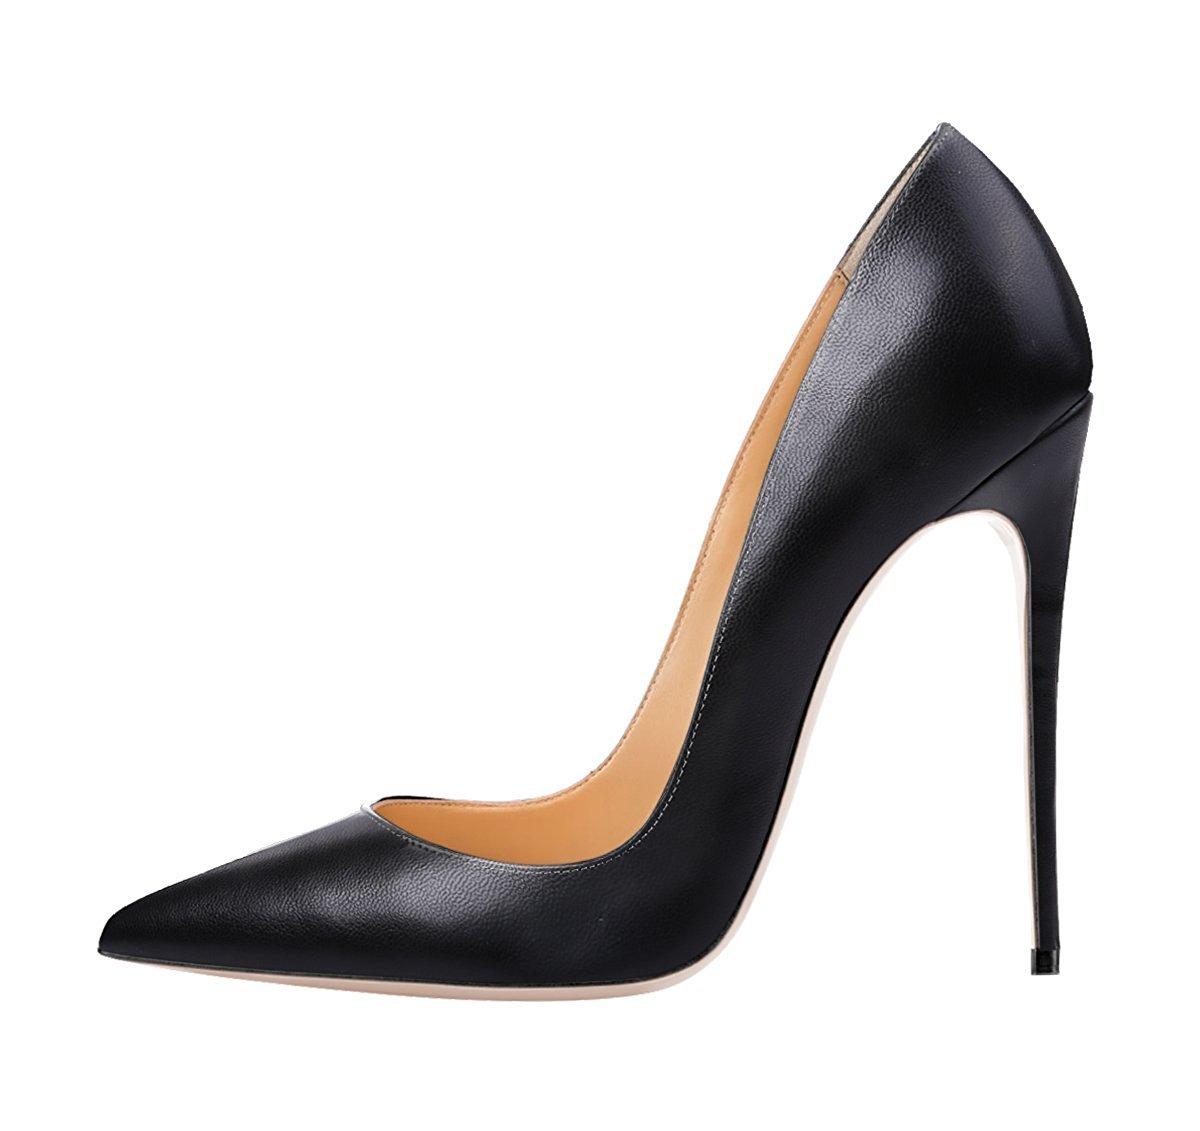 Jushee Damen Sexy Klassische Schwarz Stiletto High Heels Kleid Buuml;ro Pumps45 EU|schwarz02